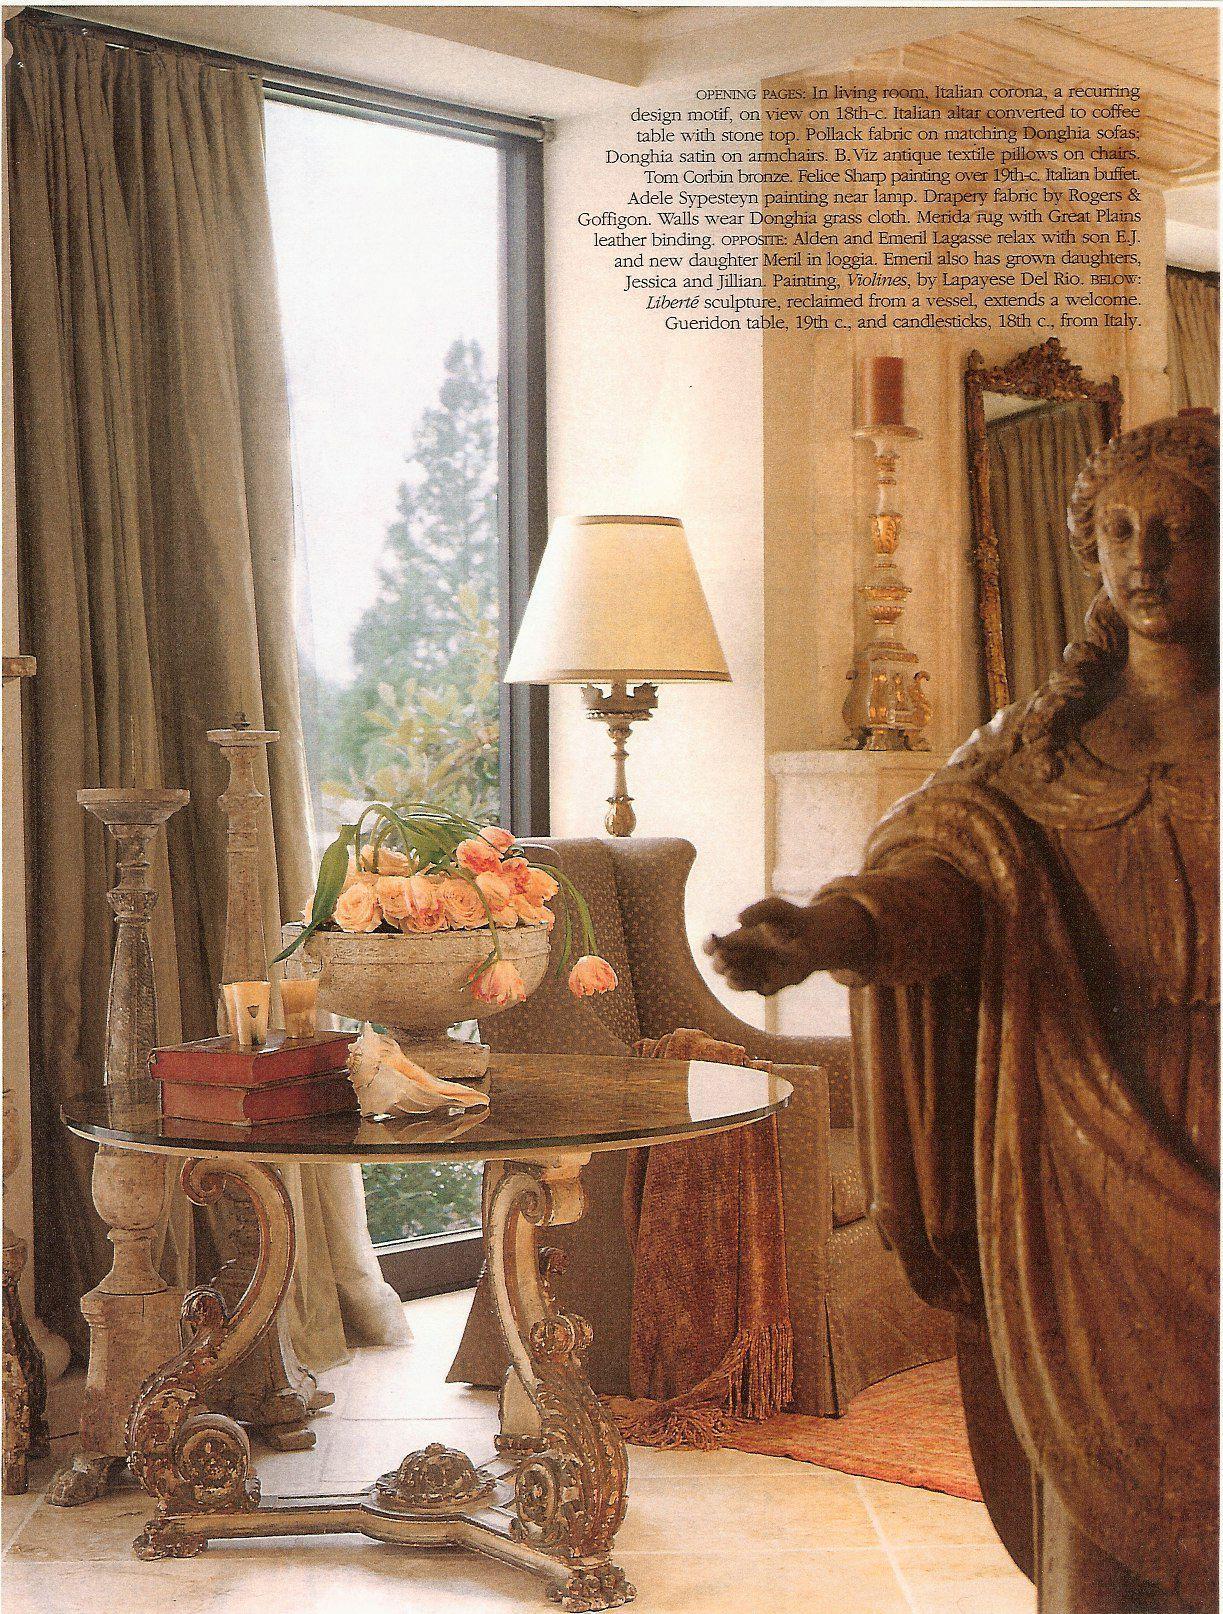 tara shaw rustic elegance pinterest interiors living rooms and vignettes. Black Bedroom Furniture Sets. Home Design Ideas